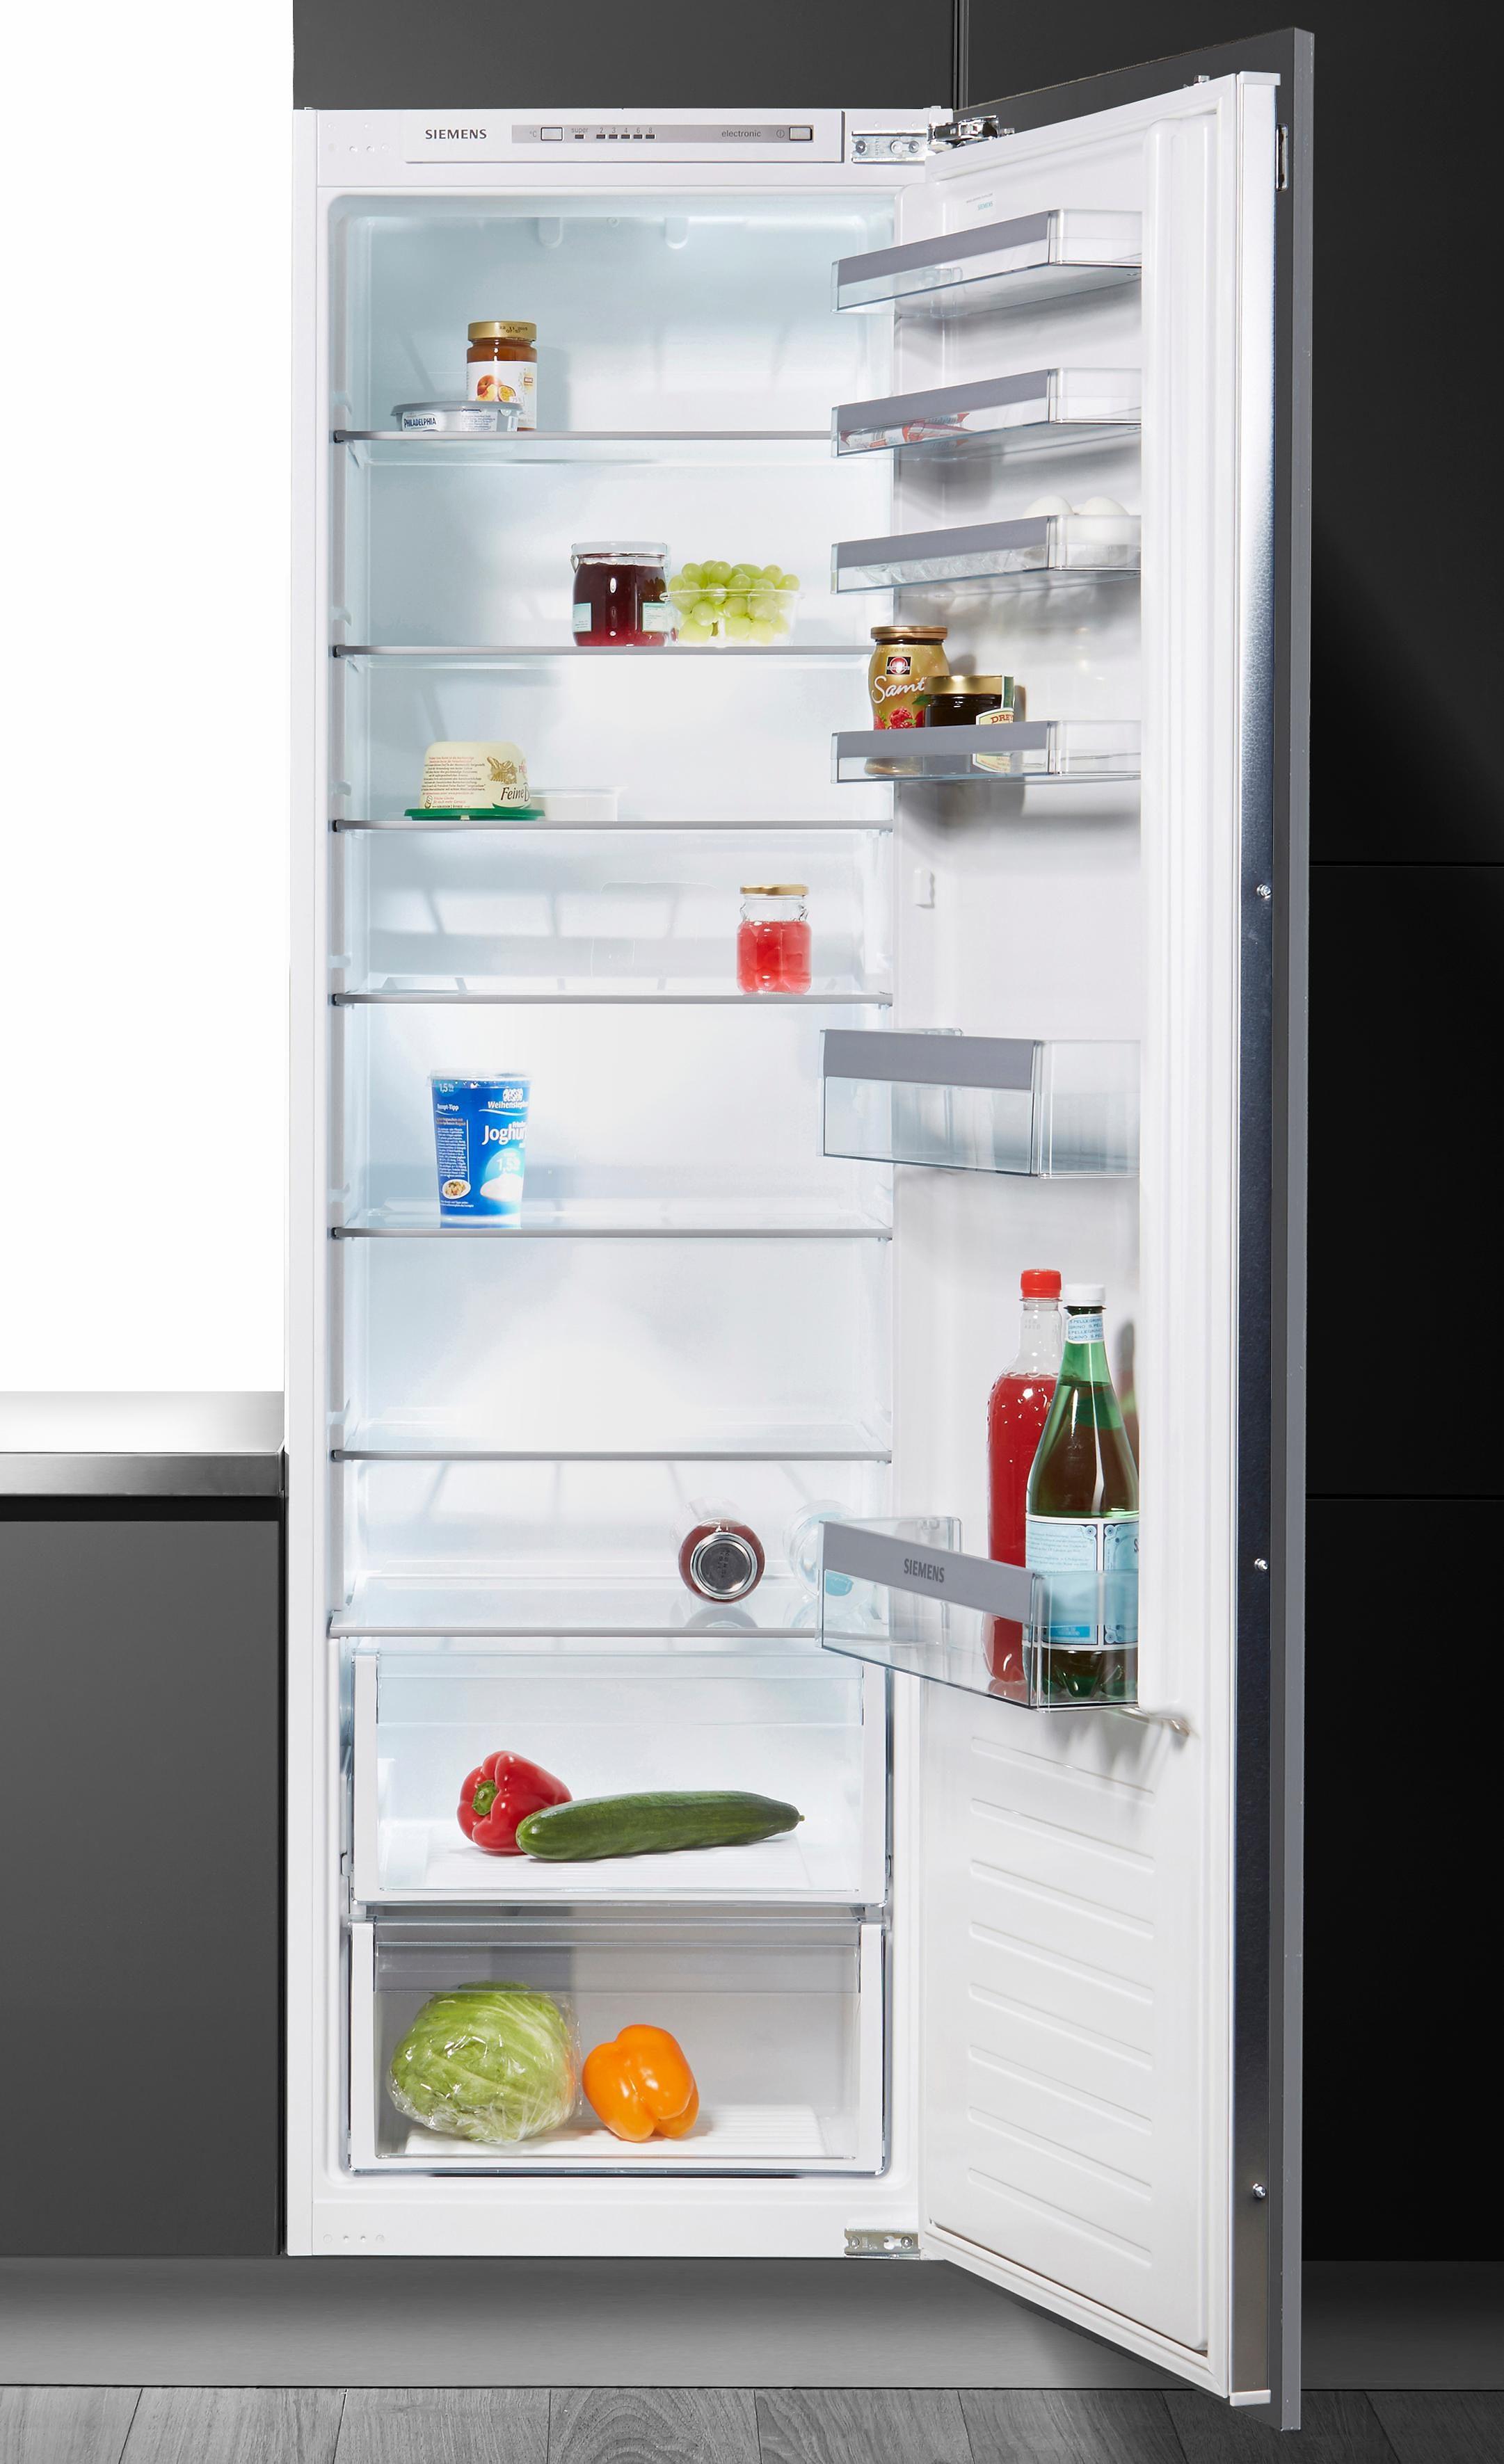 Siemens Einbau-Kühlautomat KI81RVF30, Energieklasse A++, hyperFresh